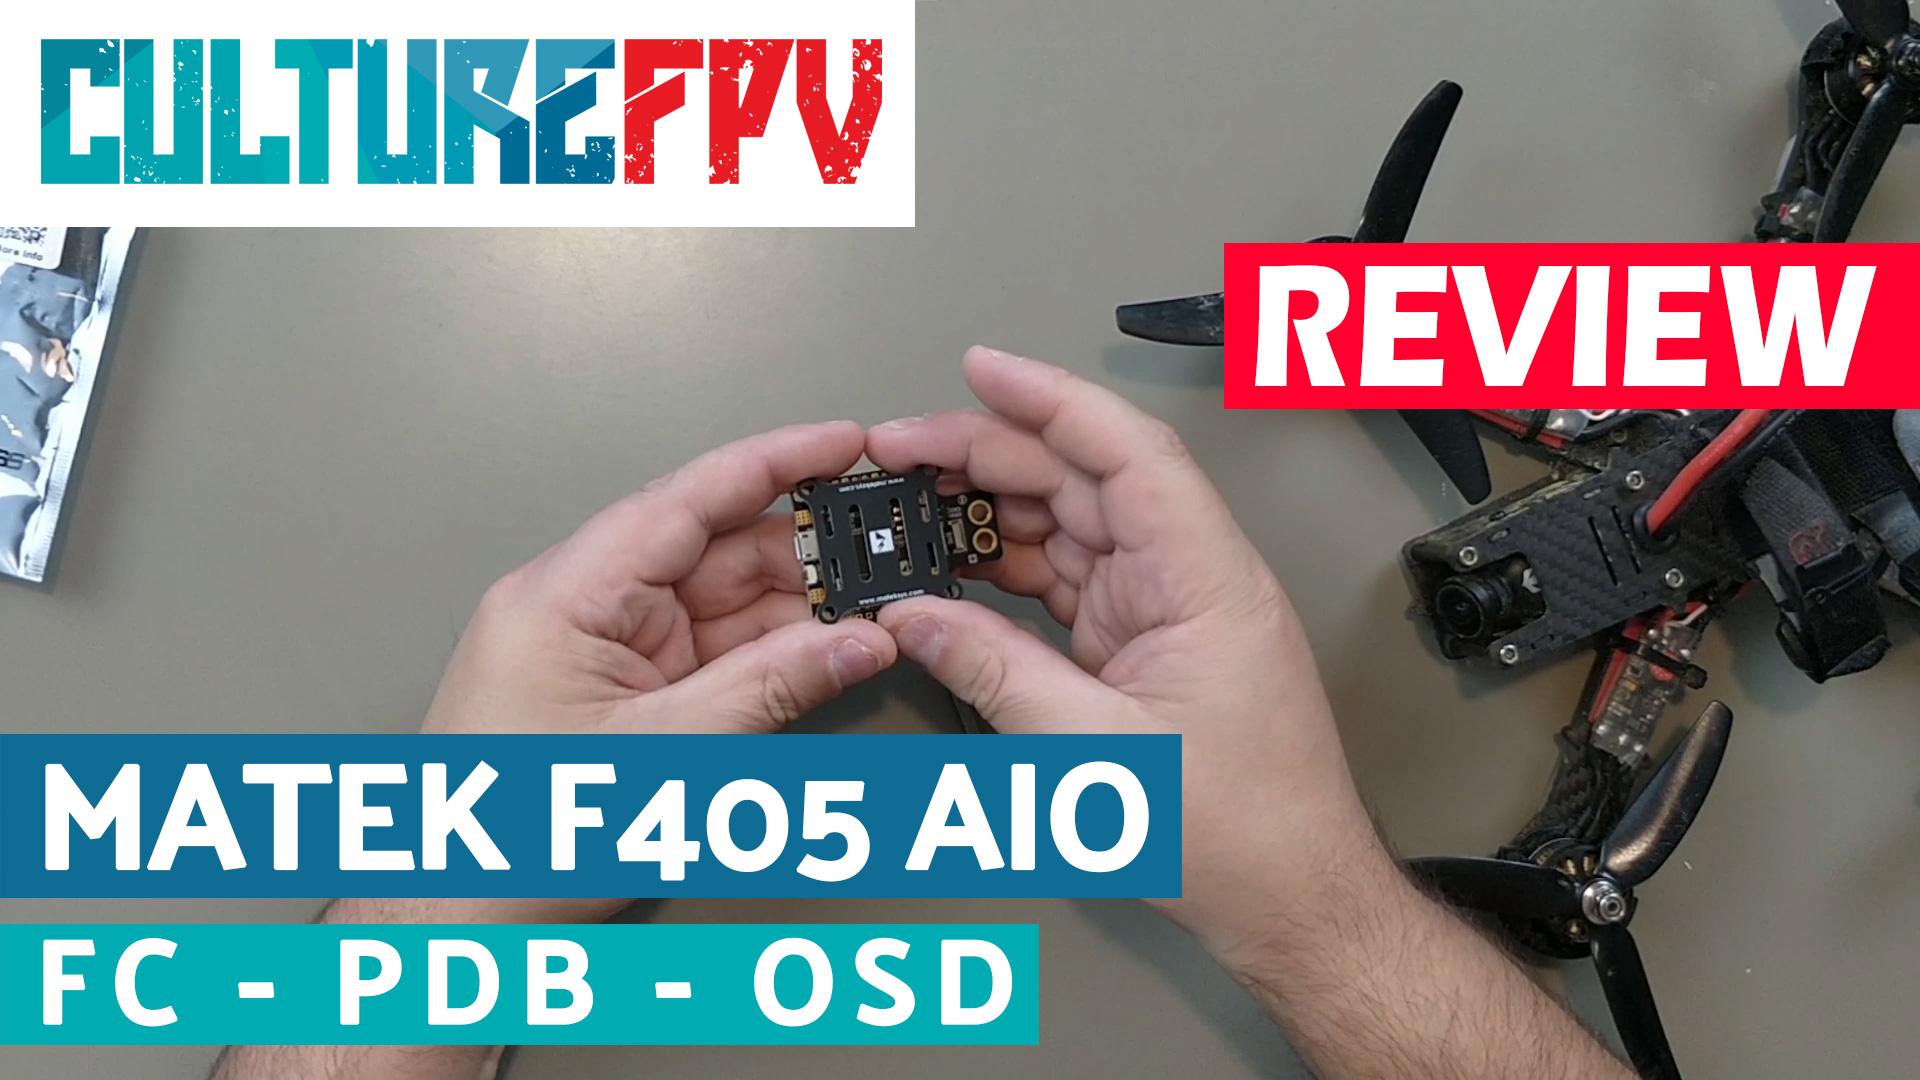 Matek F405 AIO